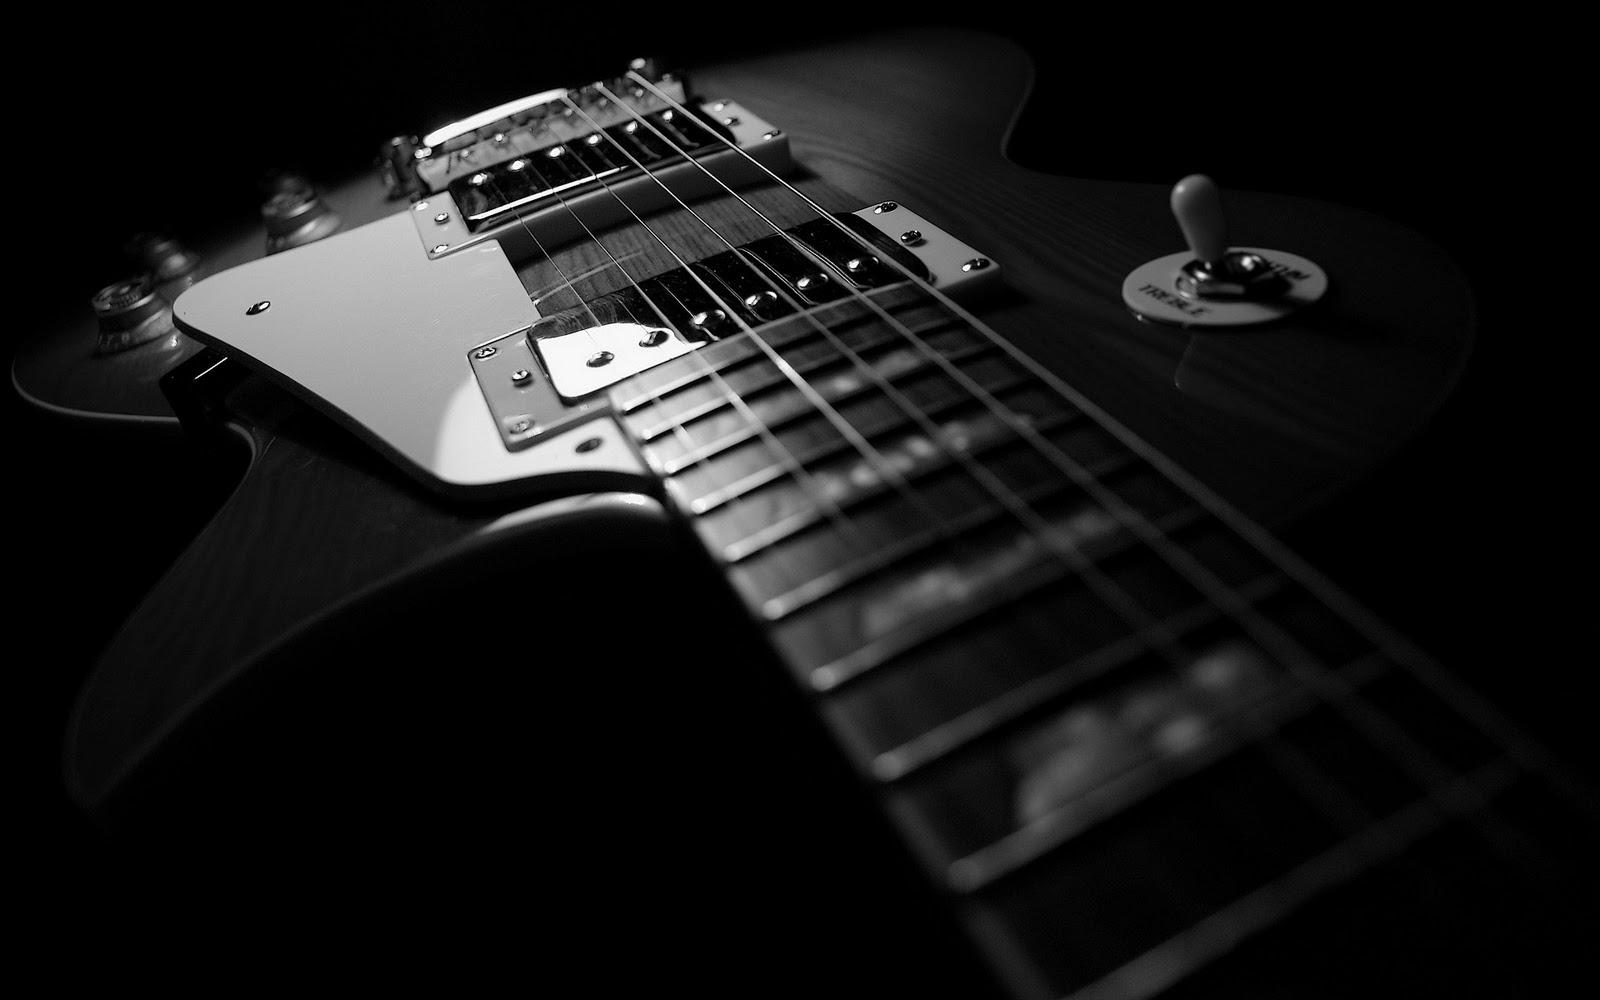 Black And White Gibson Les Paul Guitar Hd Guitar Music Desktop Wallpaper 1920x1200 Great Guitar Sound Www Greatguitarsound Blogspot Com 365 Bond